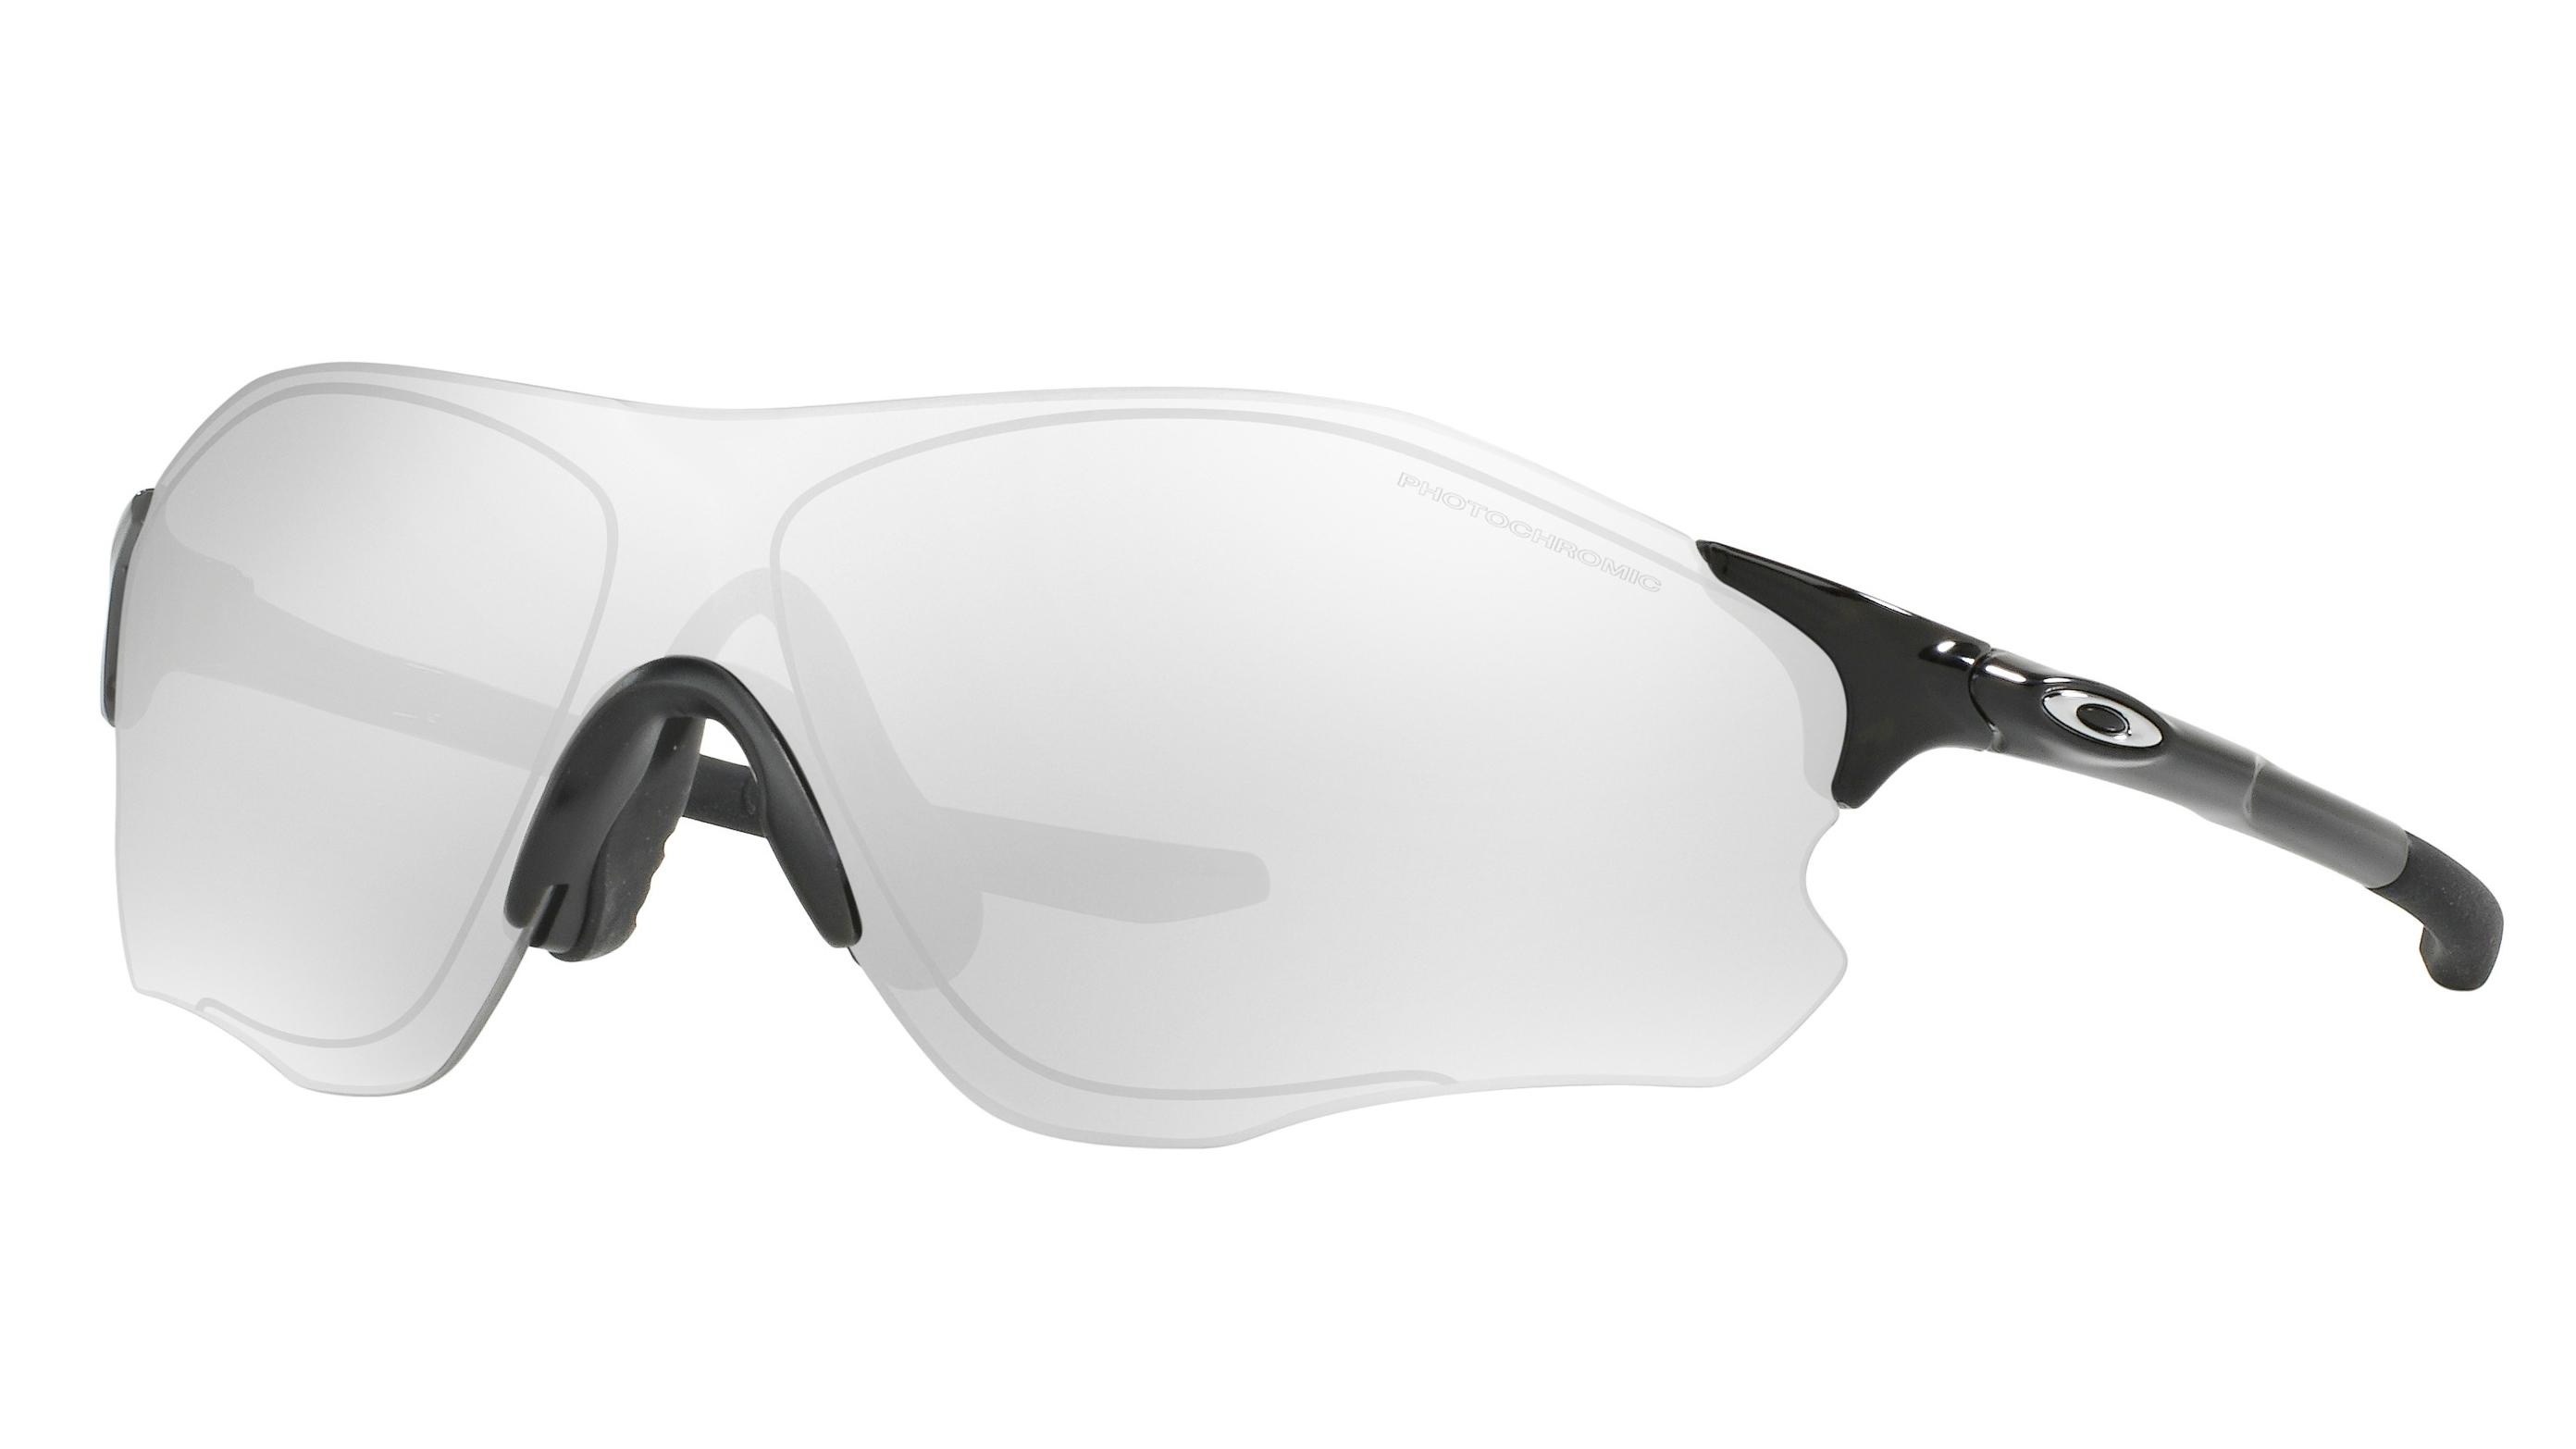 b17b1f0f74f73 Oakley Evzero Path Cycling Sunglasses